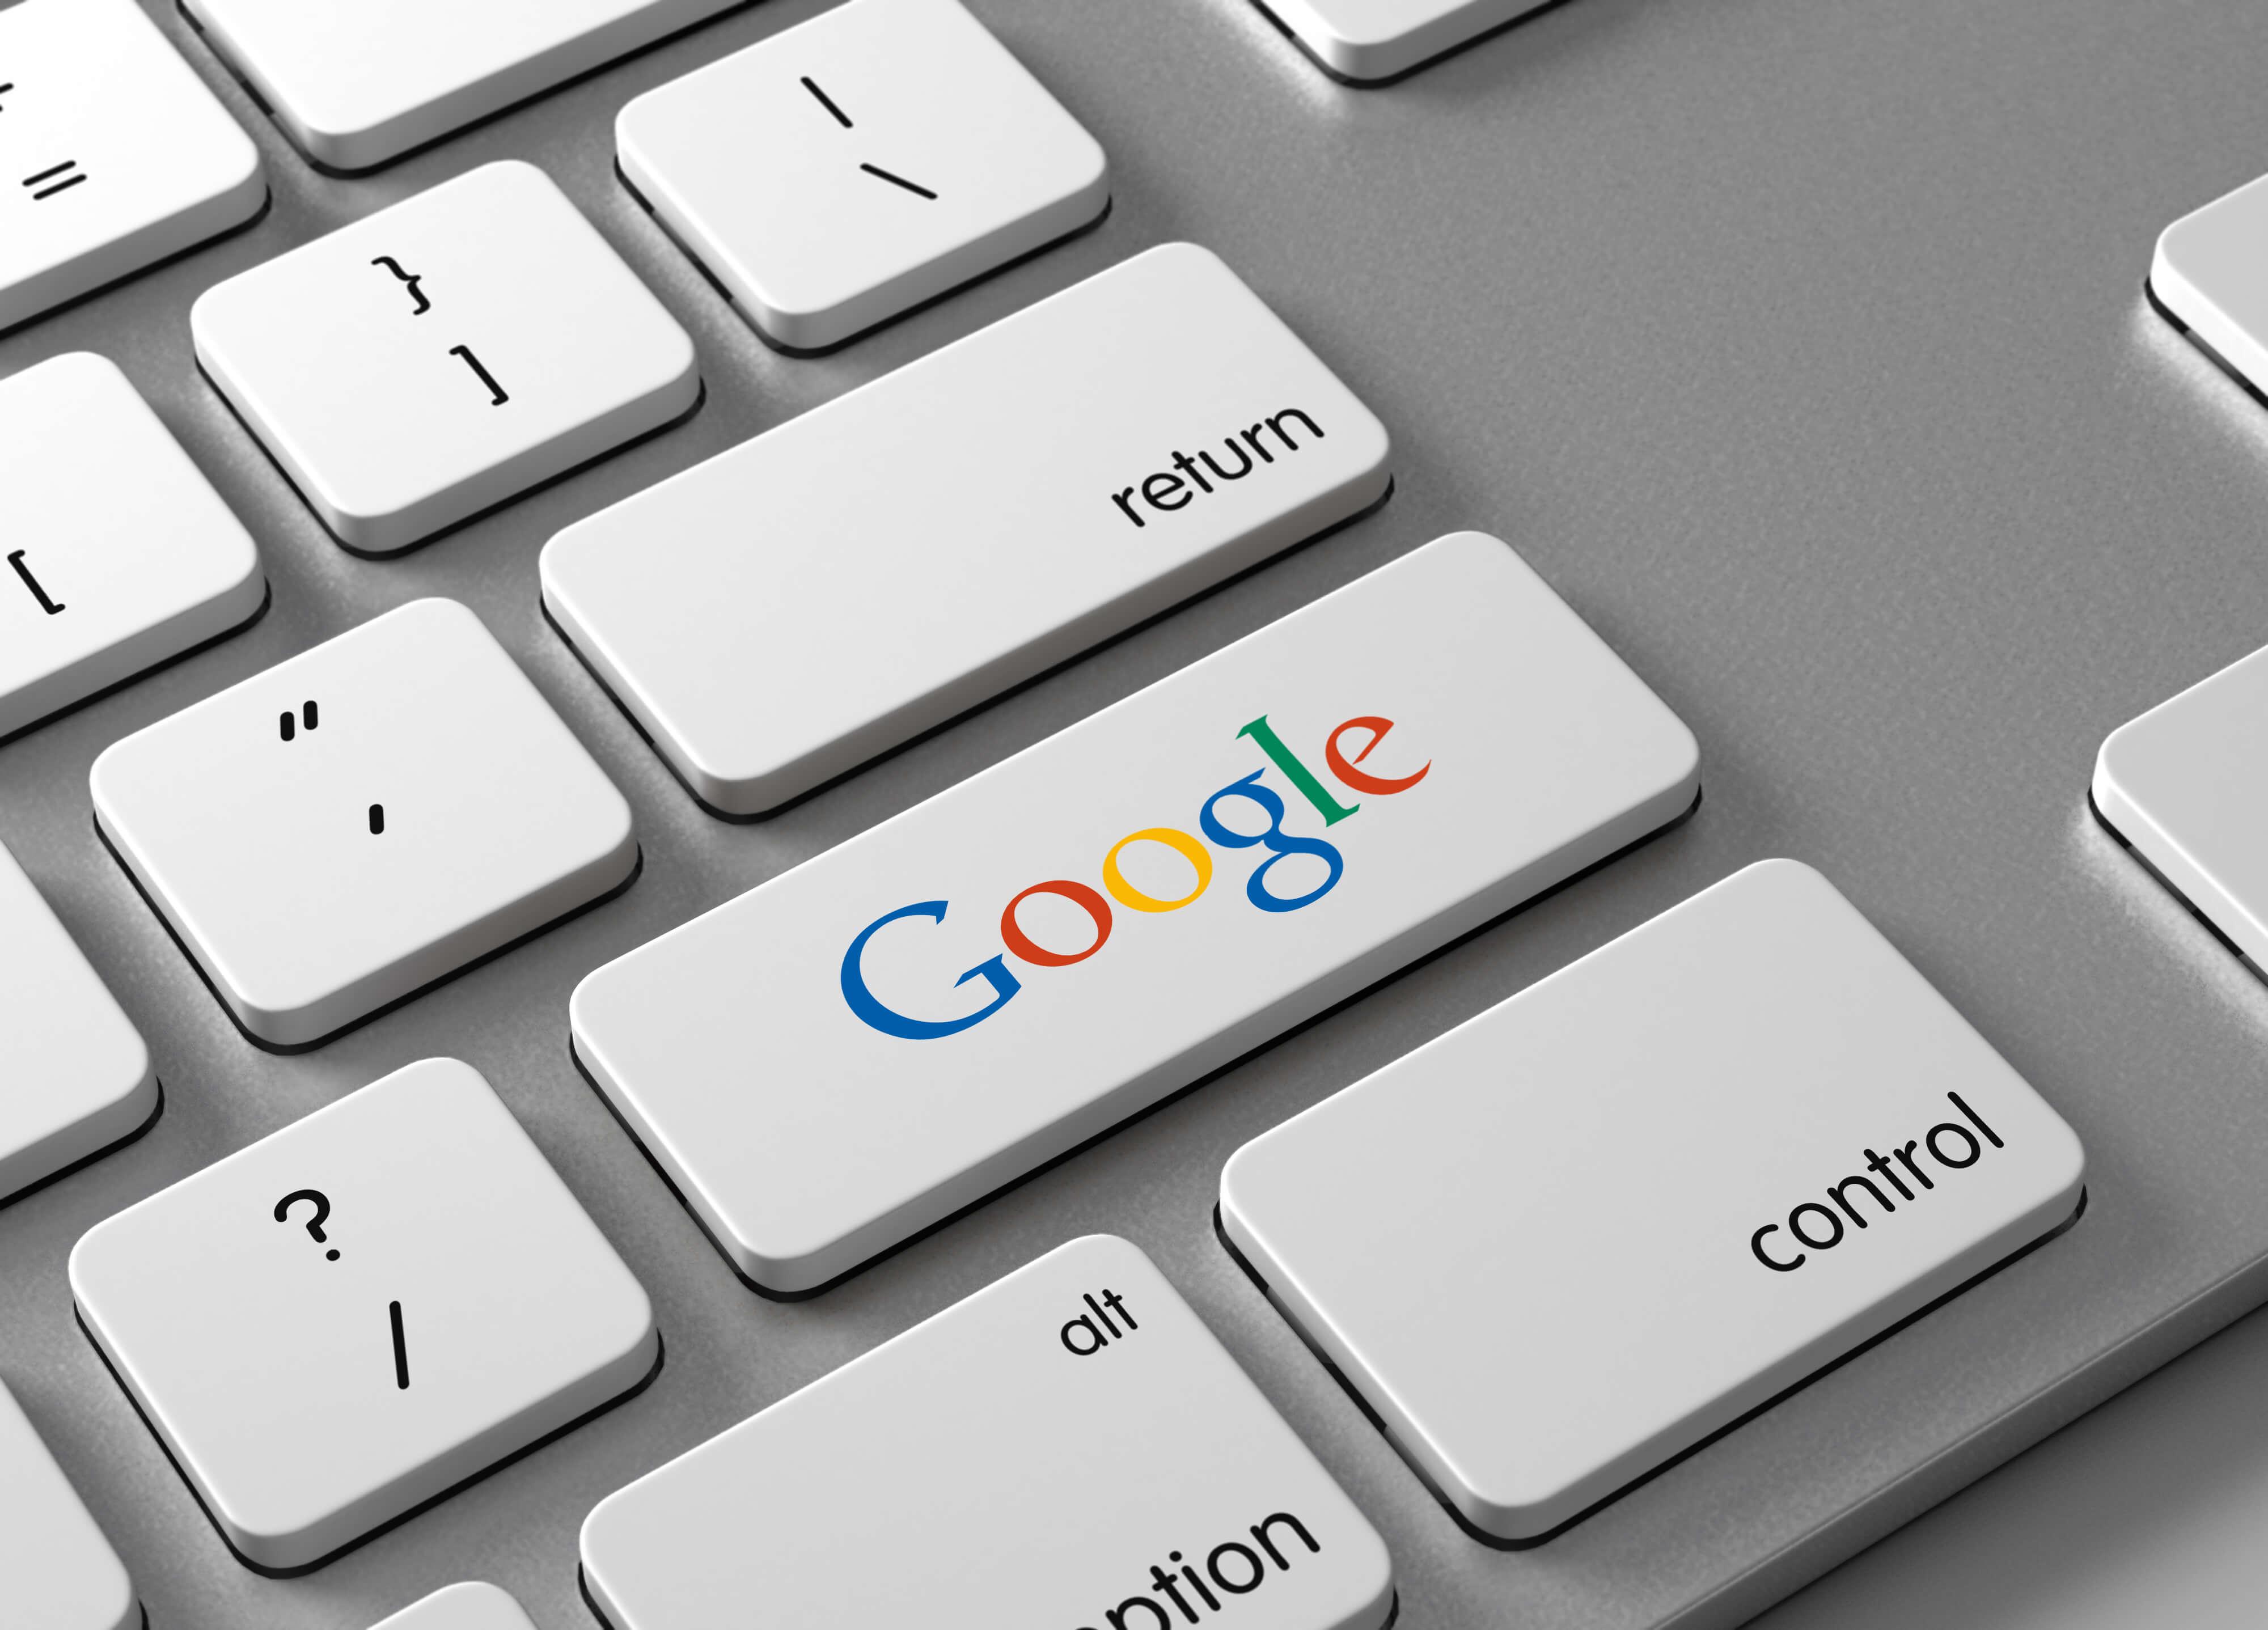 hakukonemarkkinointi sem search engine marketing-google ads adwords